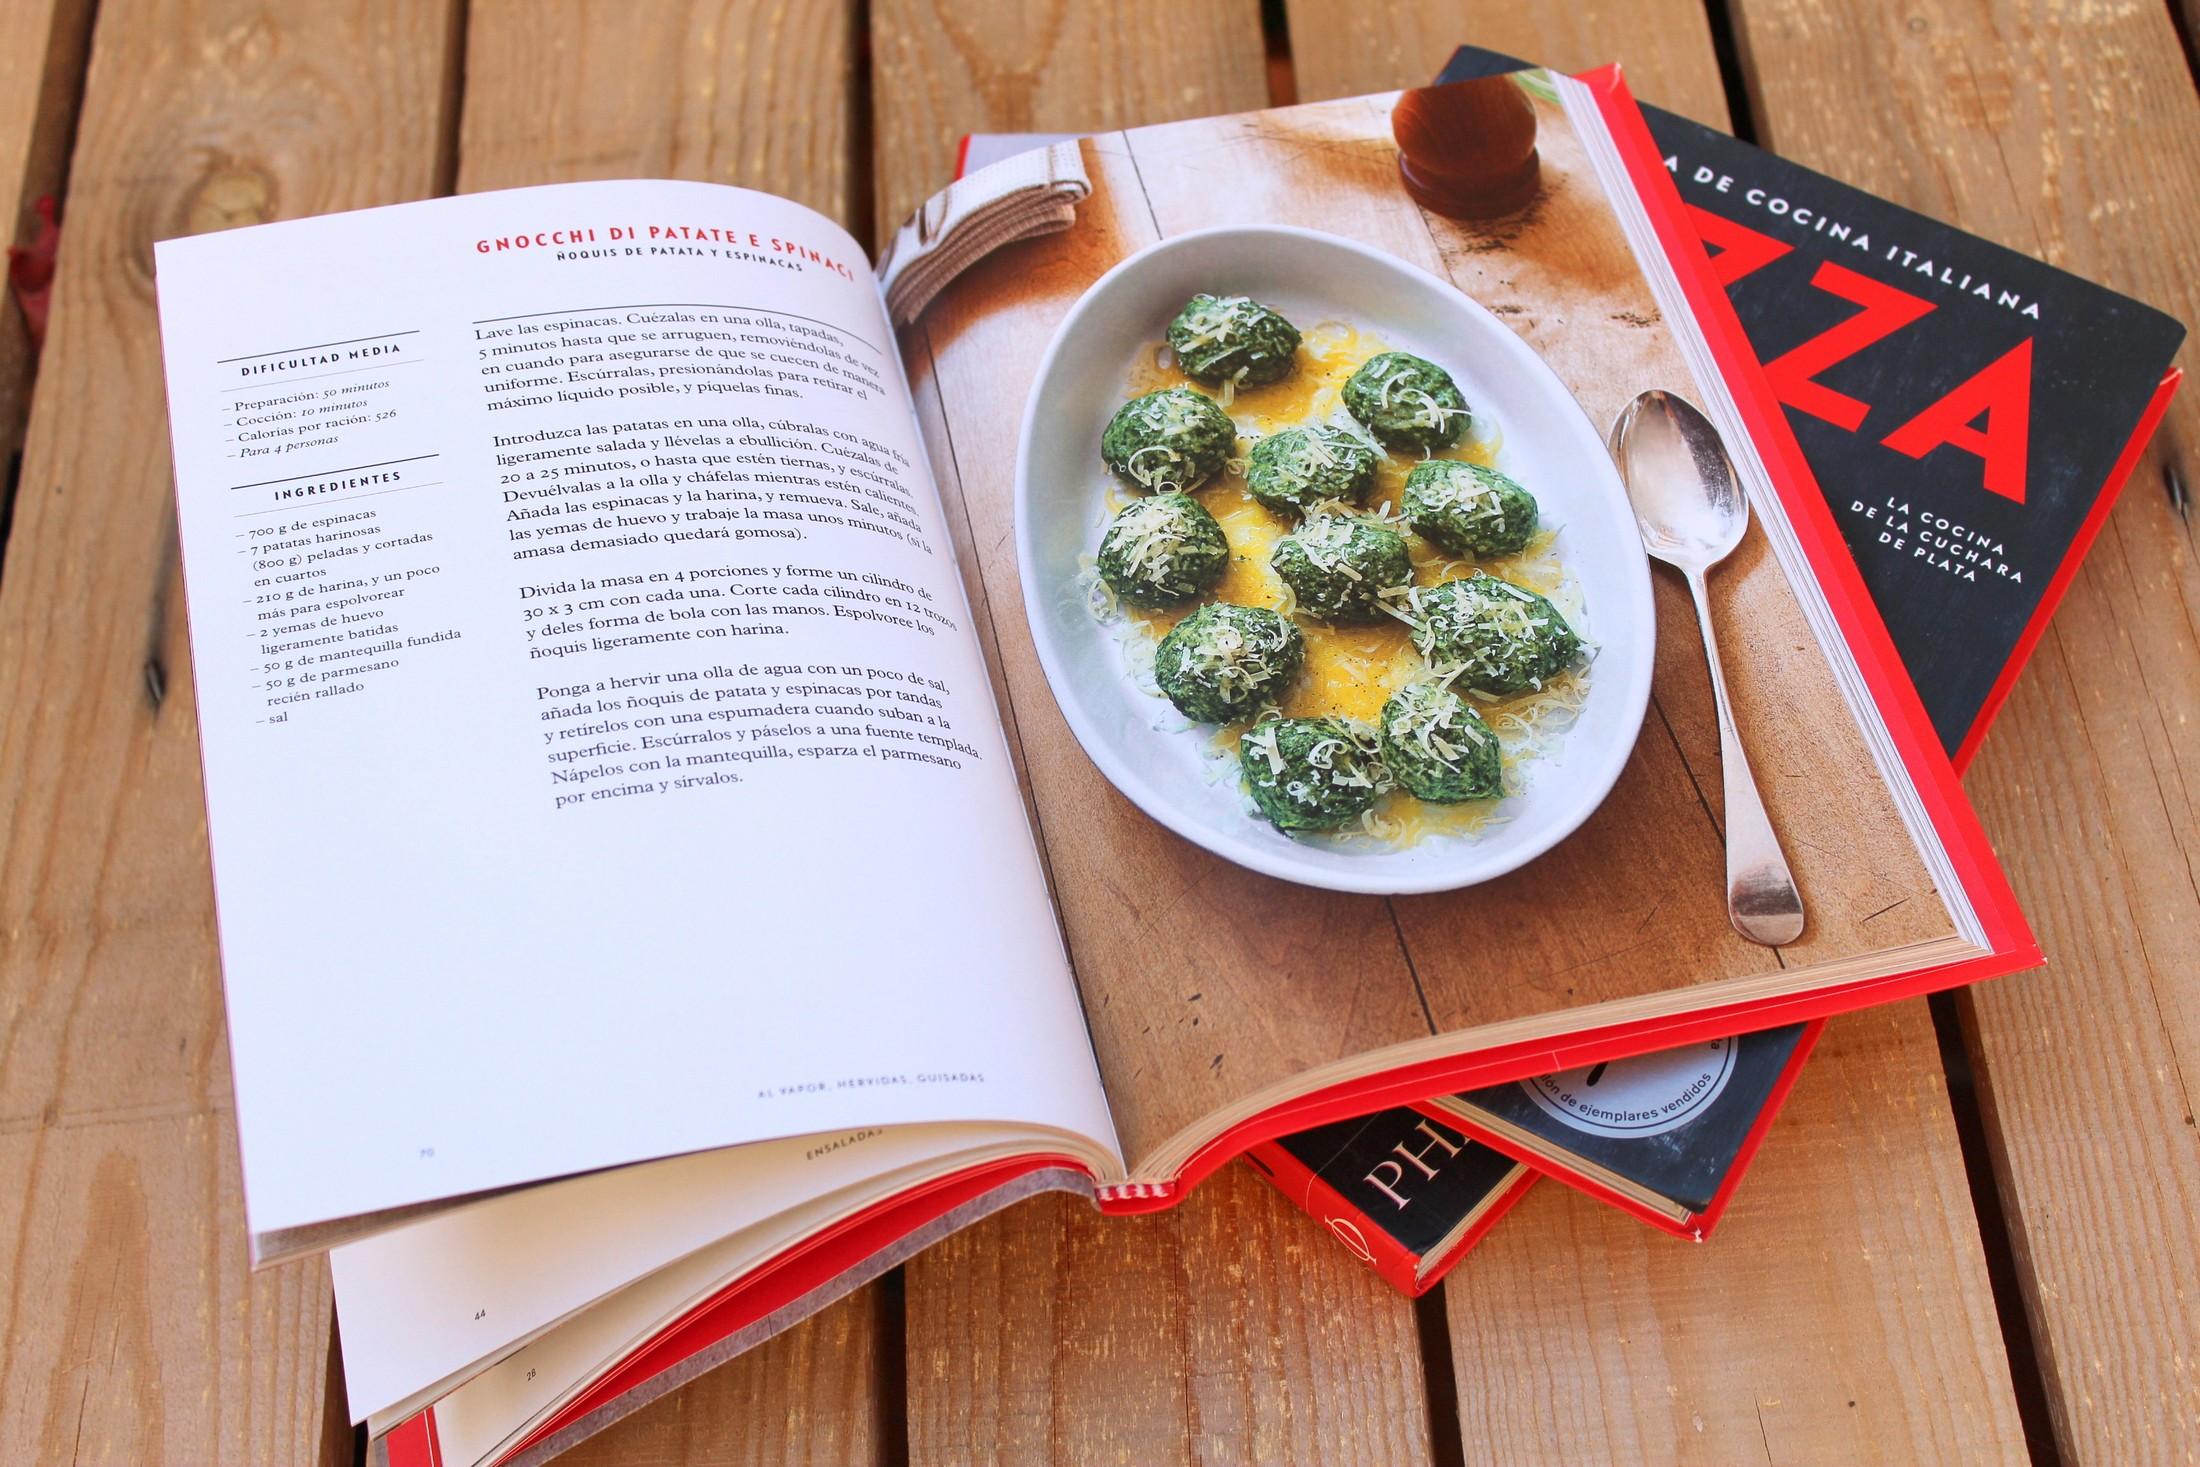 Interior de Escuela de cocina Italiana: Verduras